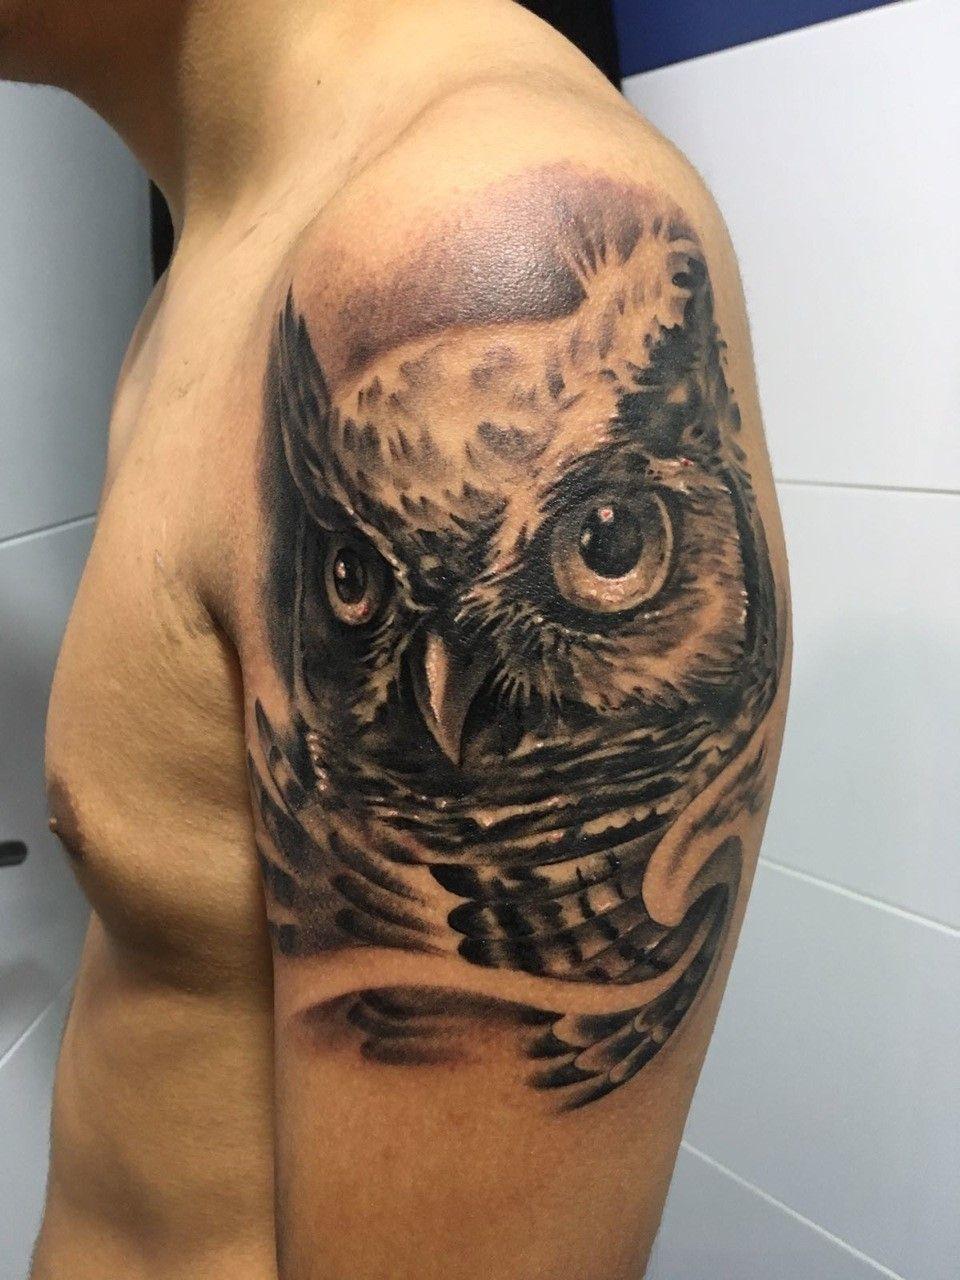 Tatuaje De Buho Realizado En Nuestro Centro De Montera De Madrid Tattoo Tattoos Tattooed Tattooin Tatuaje Buho Tatuajes Tatuaje De Las Manos En Oracion